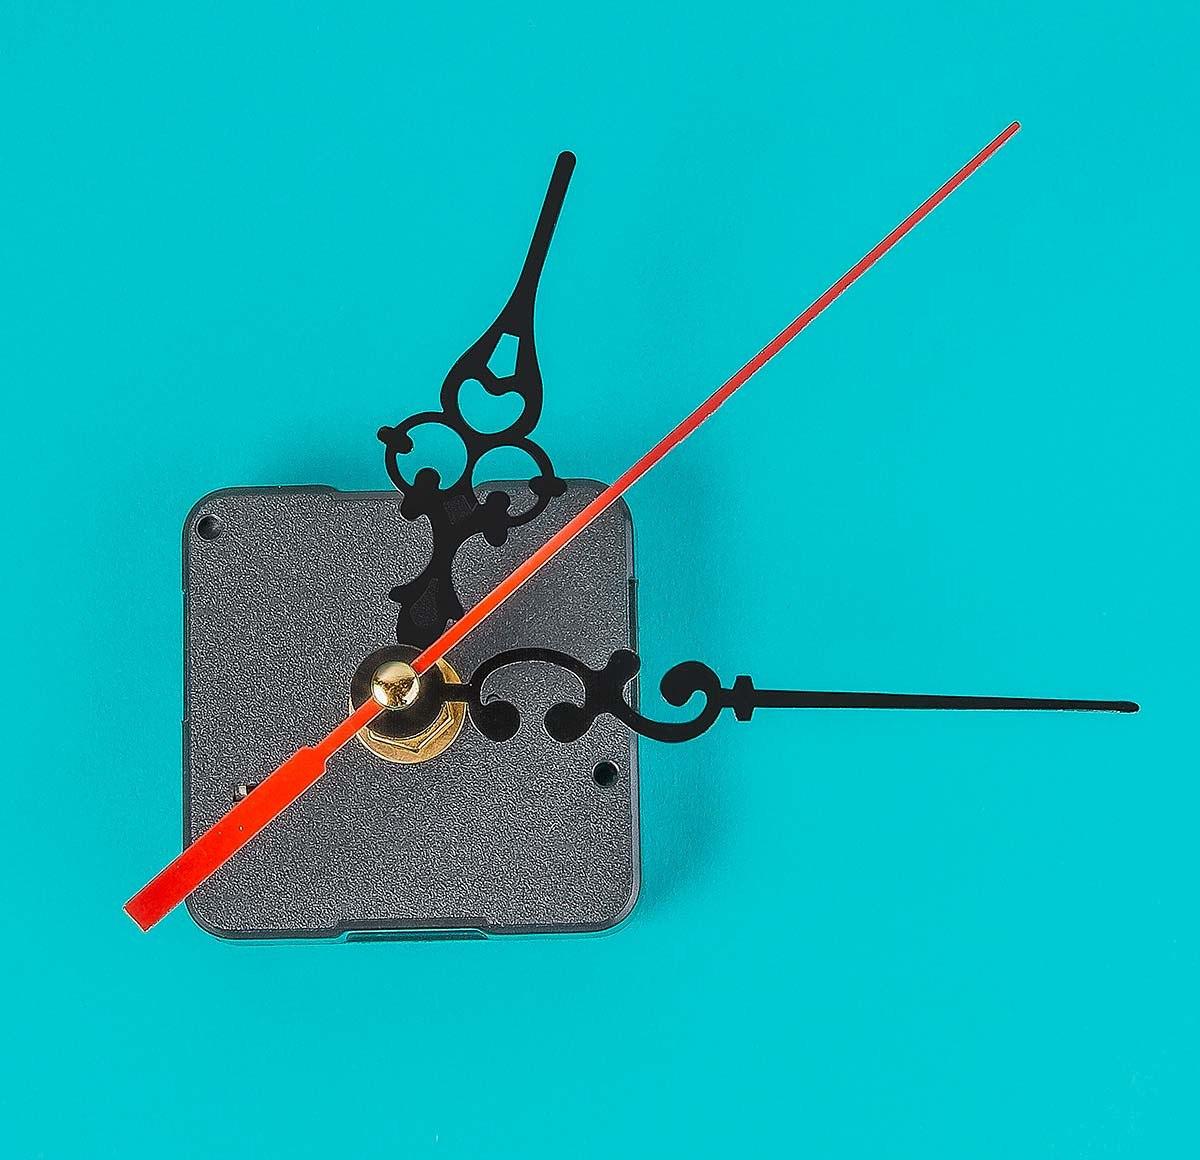 Reloj maquinaria para reloj de pared en mercado libre - Mecanismo para reloj de pared ...